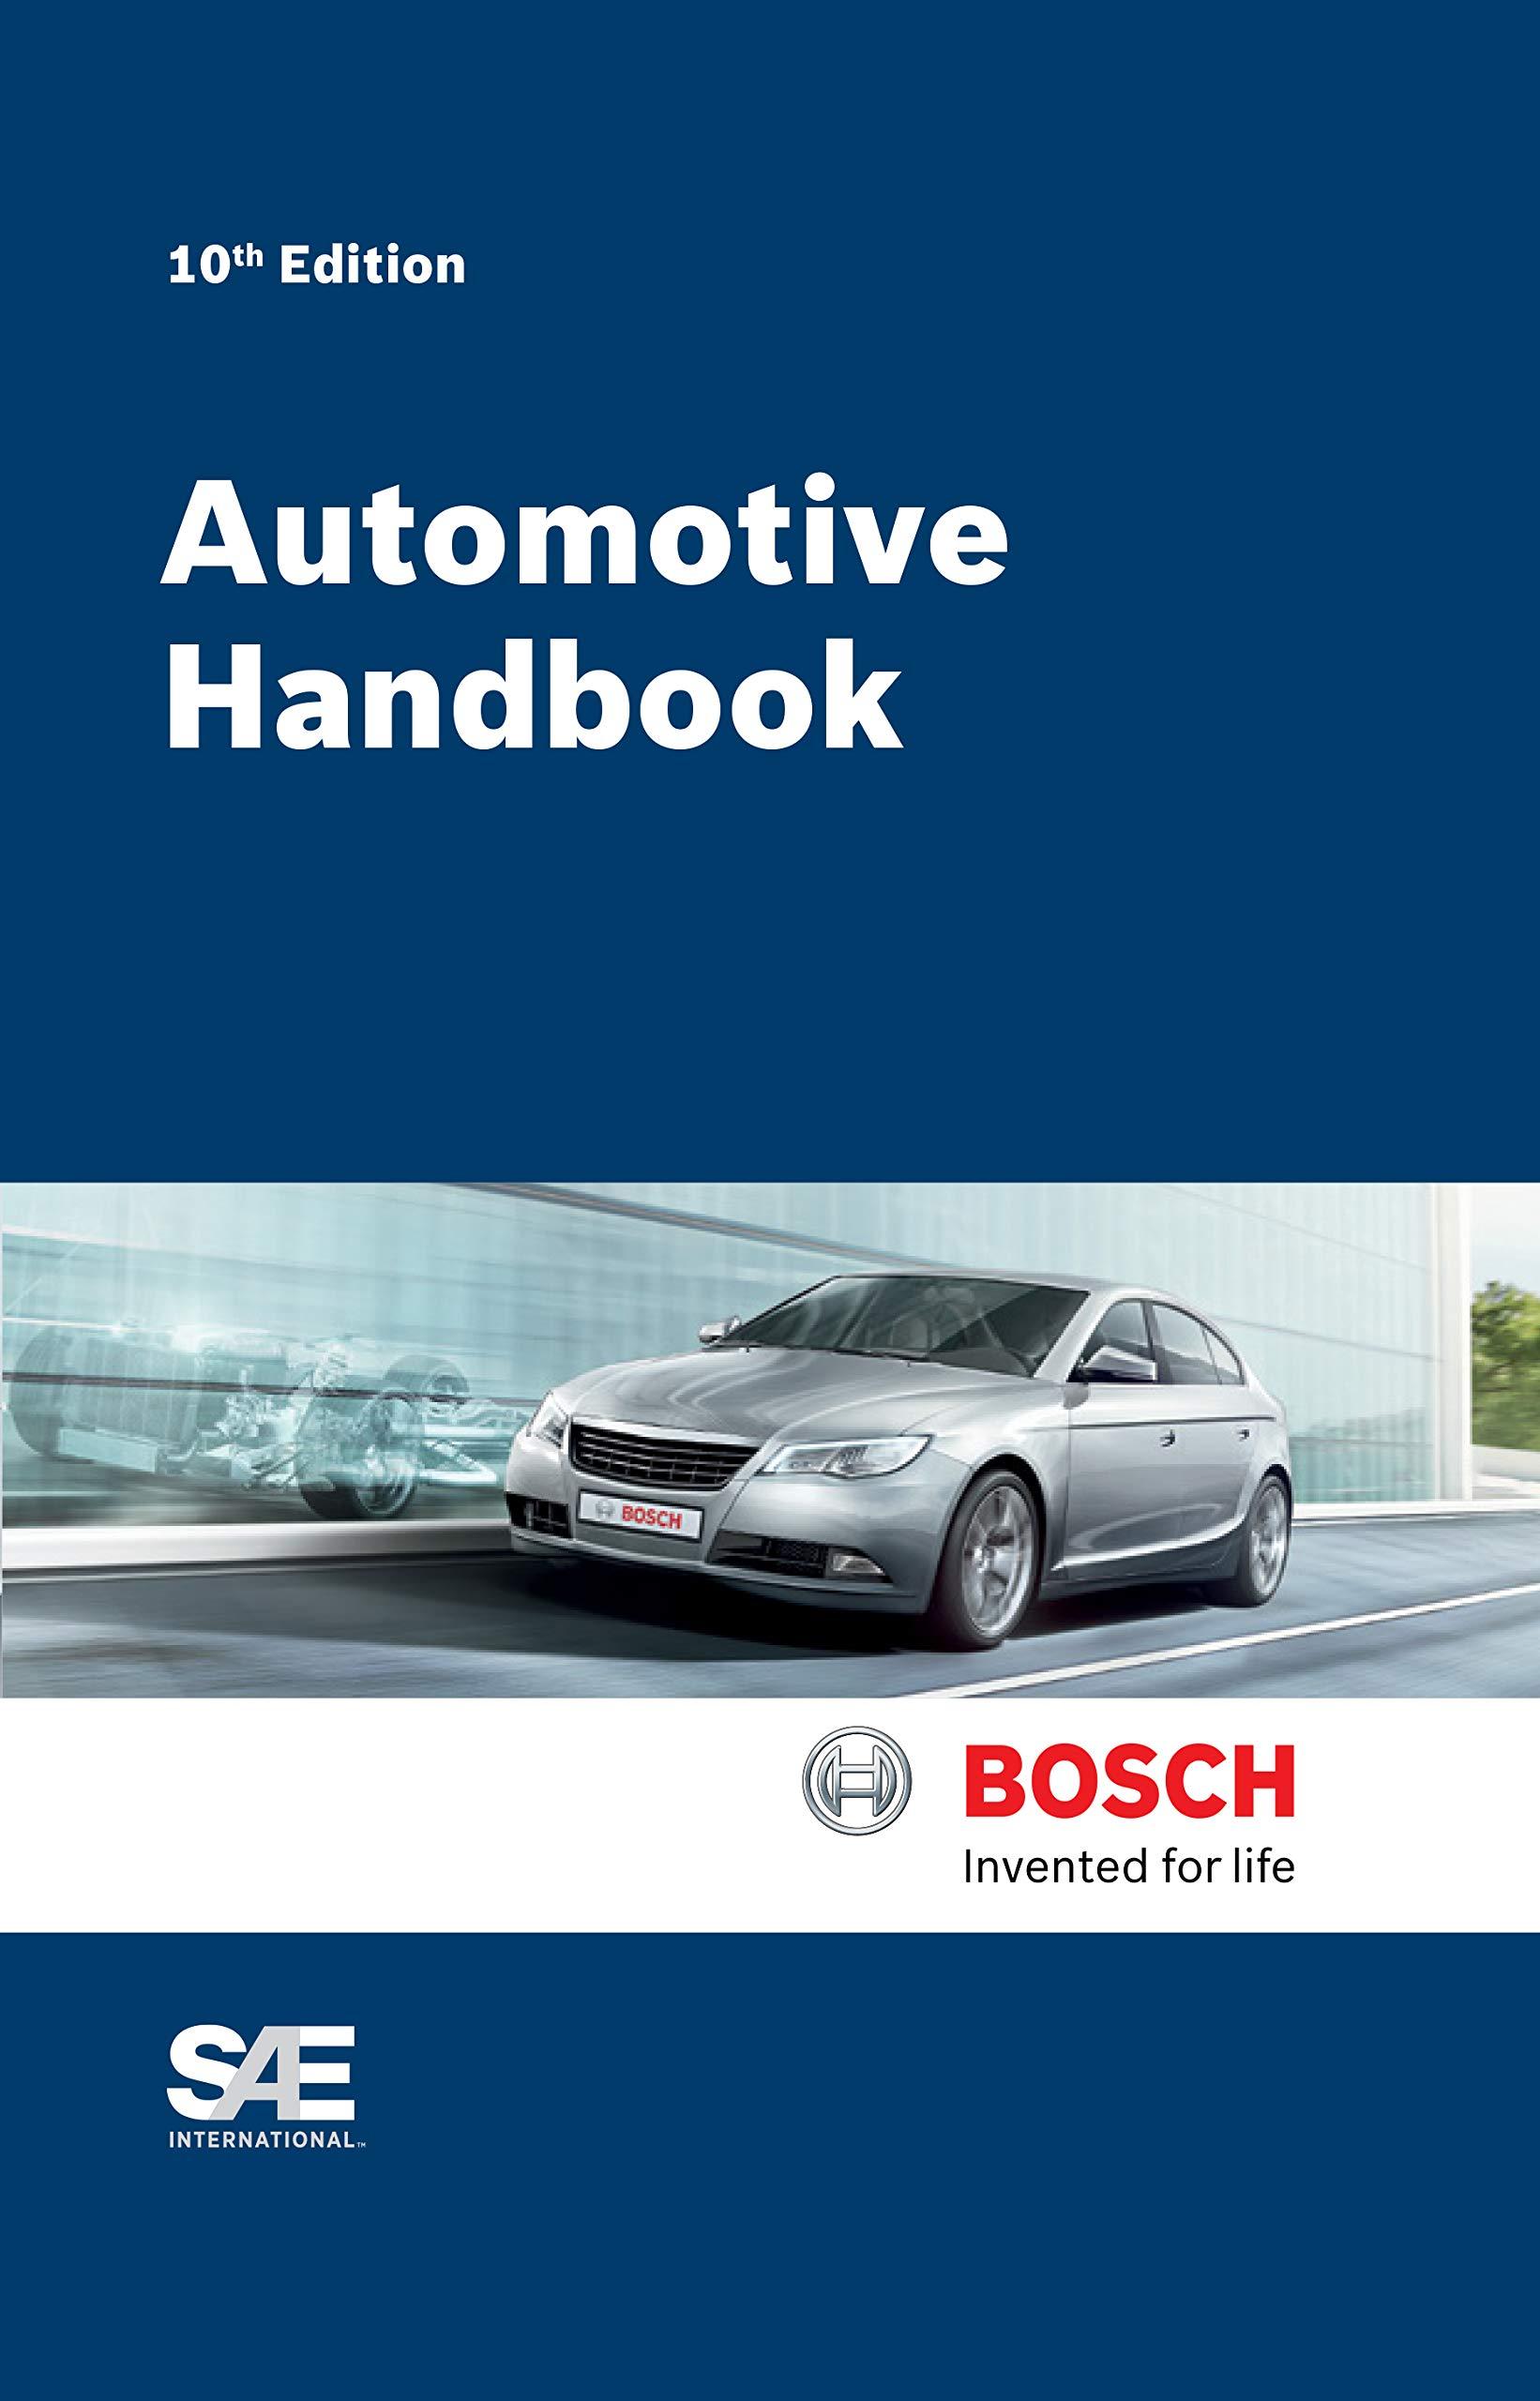 Bosch Automotive Handbook, 10th Edition: Robert Bosch GmbH